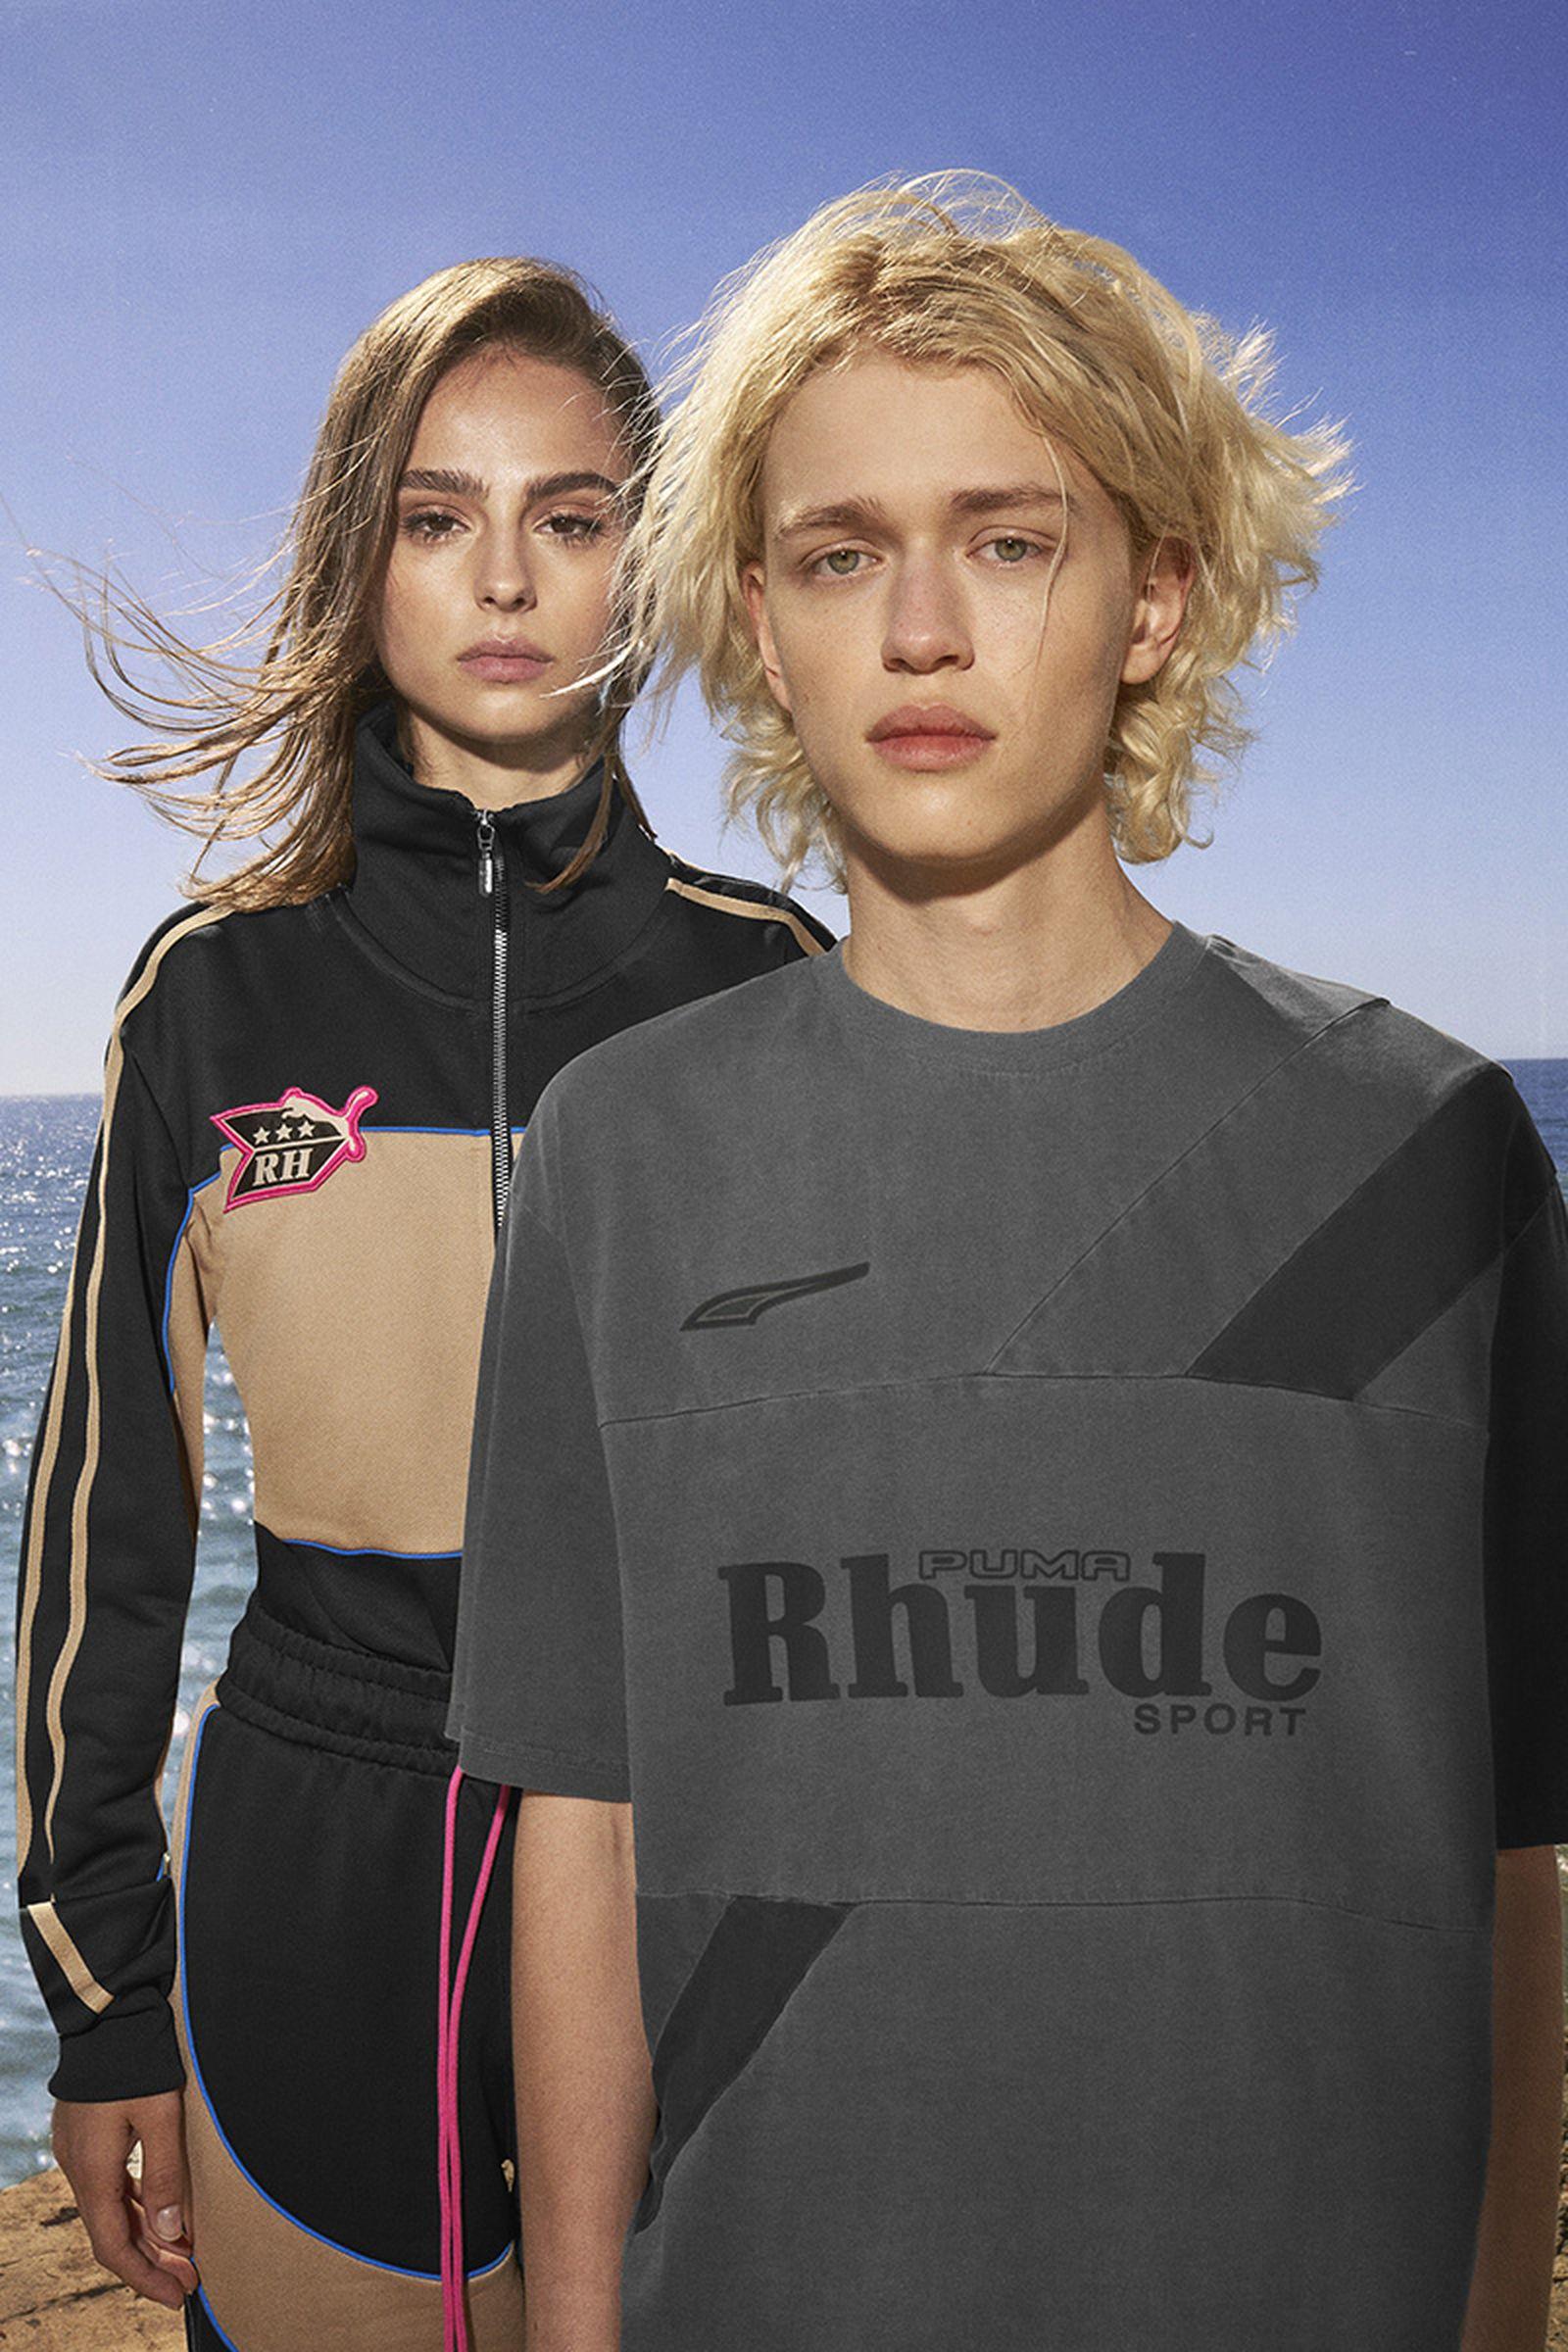 PUMA RHUDE SS20 collection